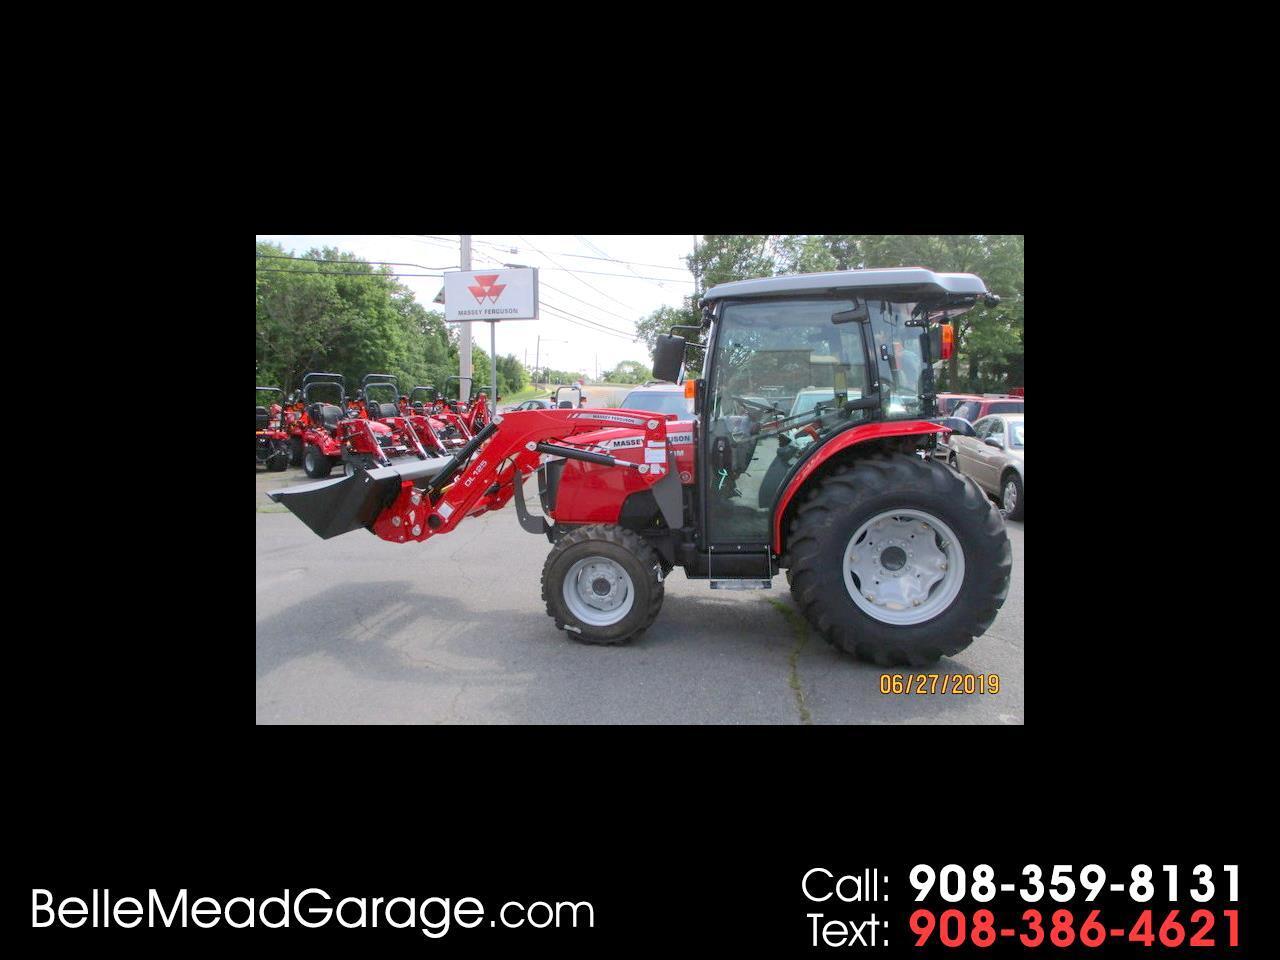 2019 Massey Ferguson Farm 1740MHL CAB 4X4 TRACTOR WITH LOADER